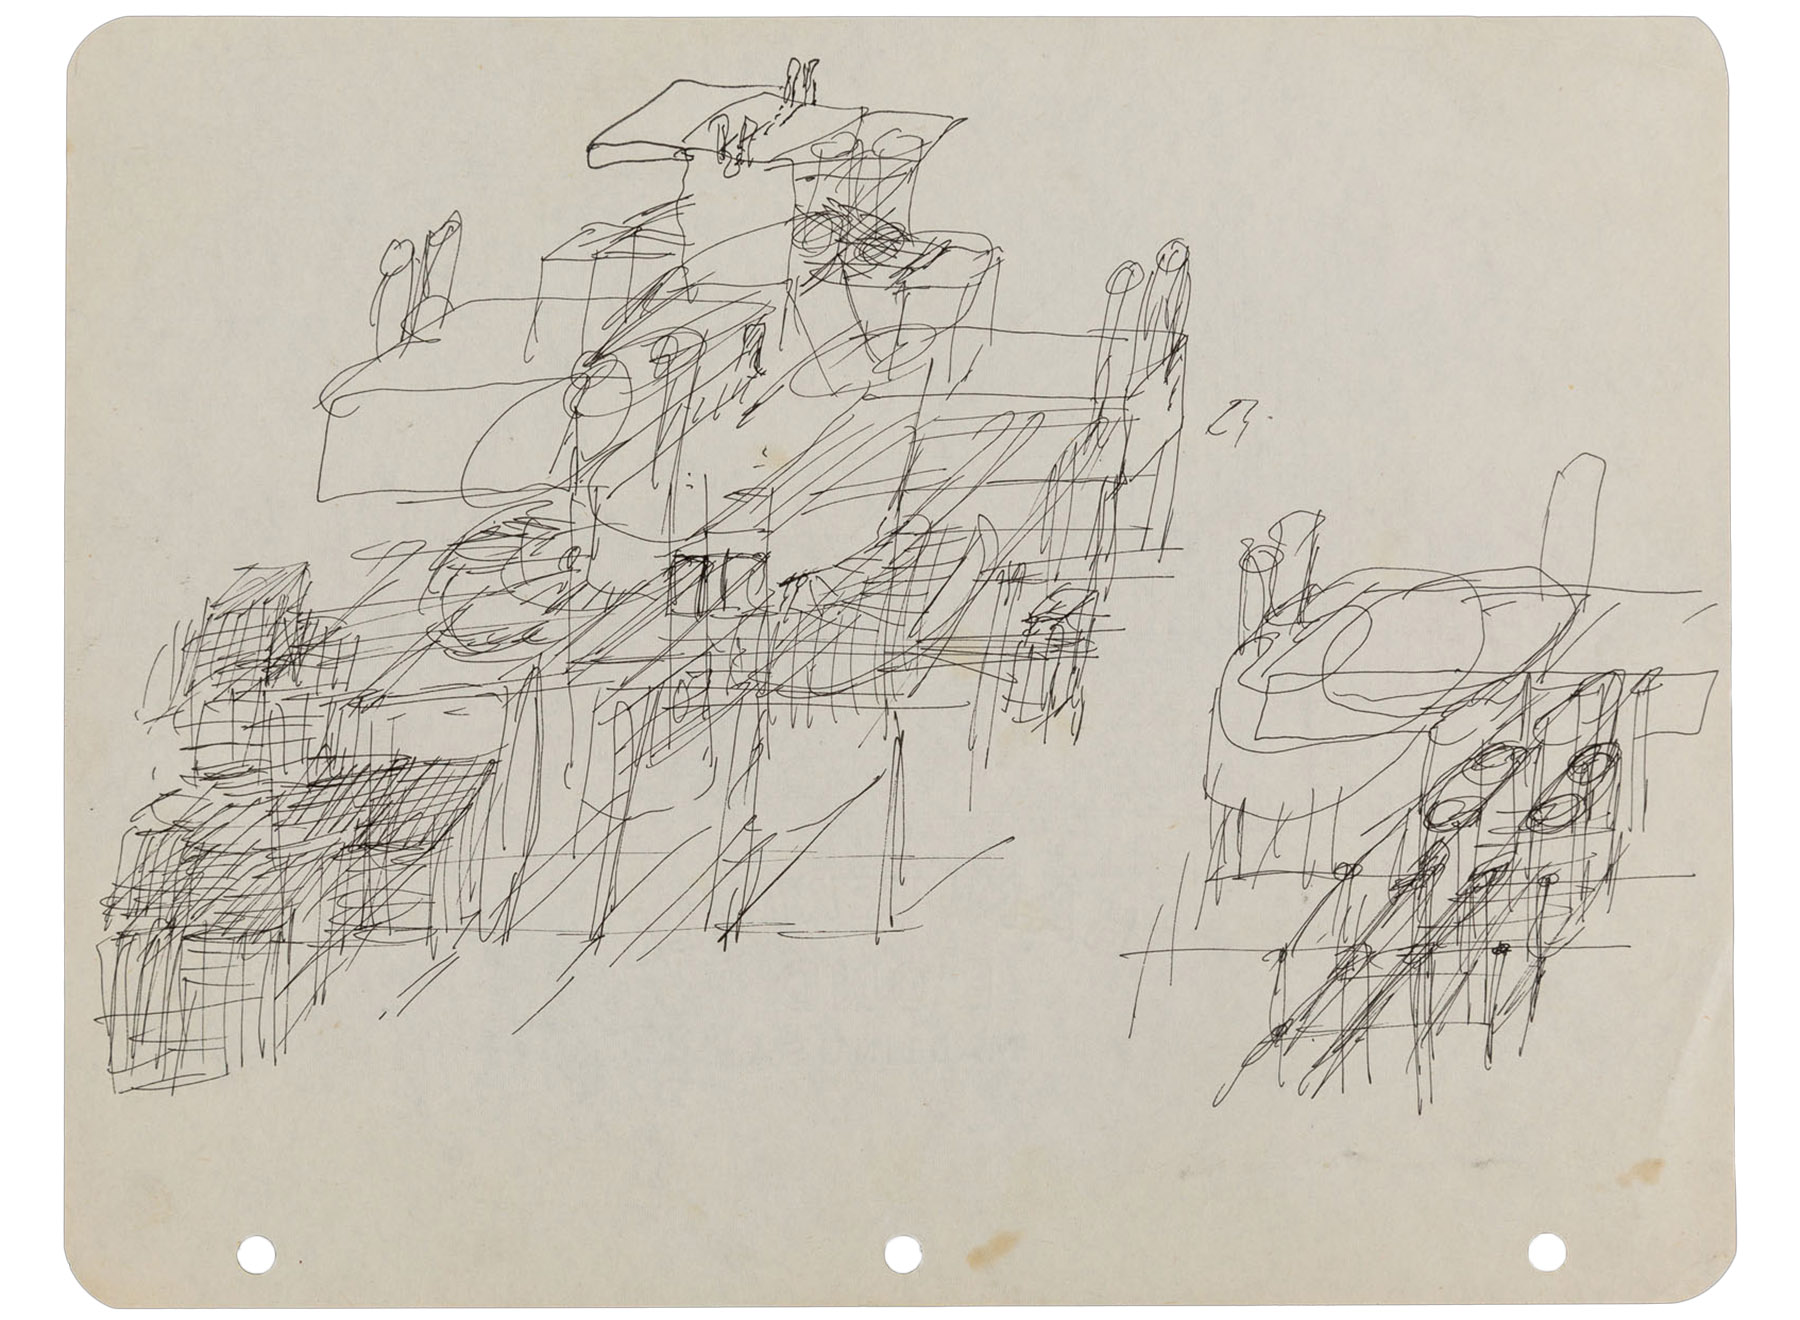 sketch for the underground city, Walter Pichler, 1960-63